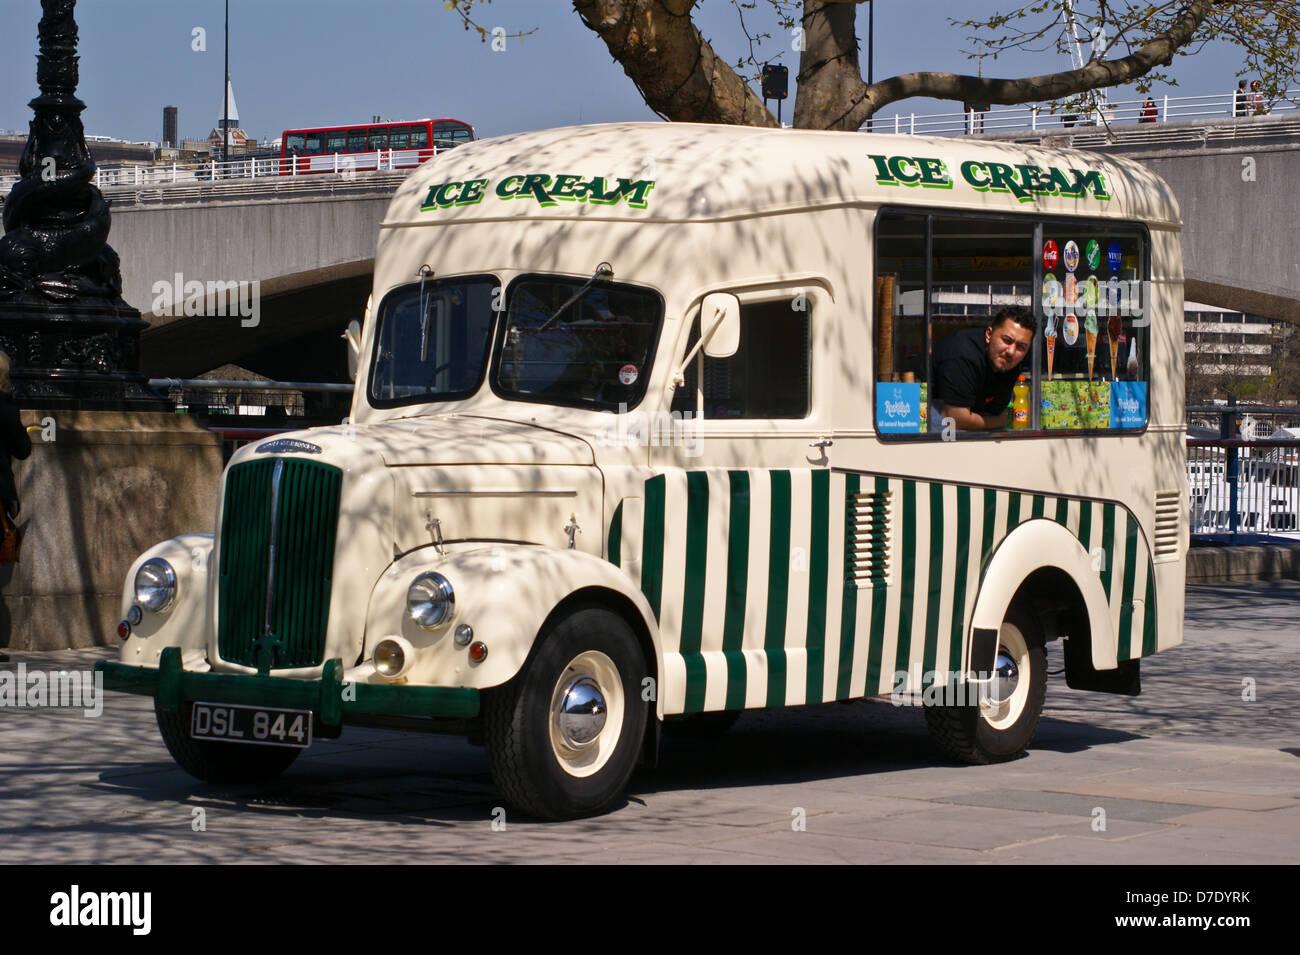 An Ice Cream Van Conversion Of A Morris Commercial 1 Ton Truck South Bank London England